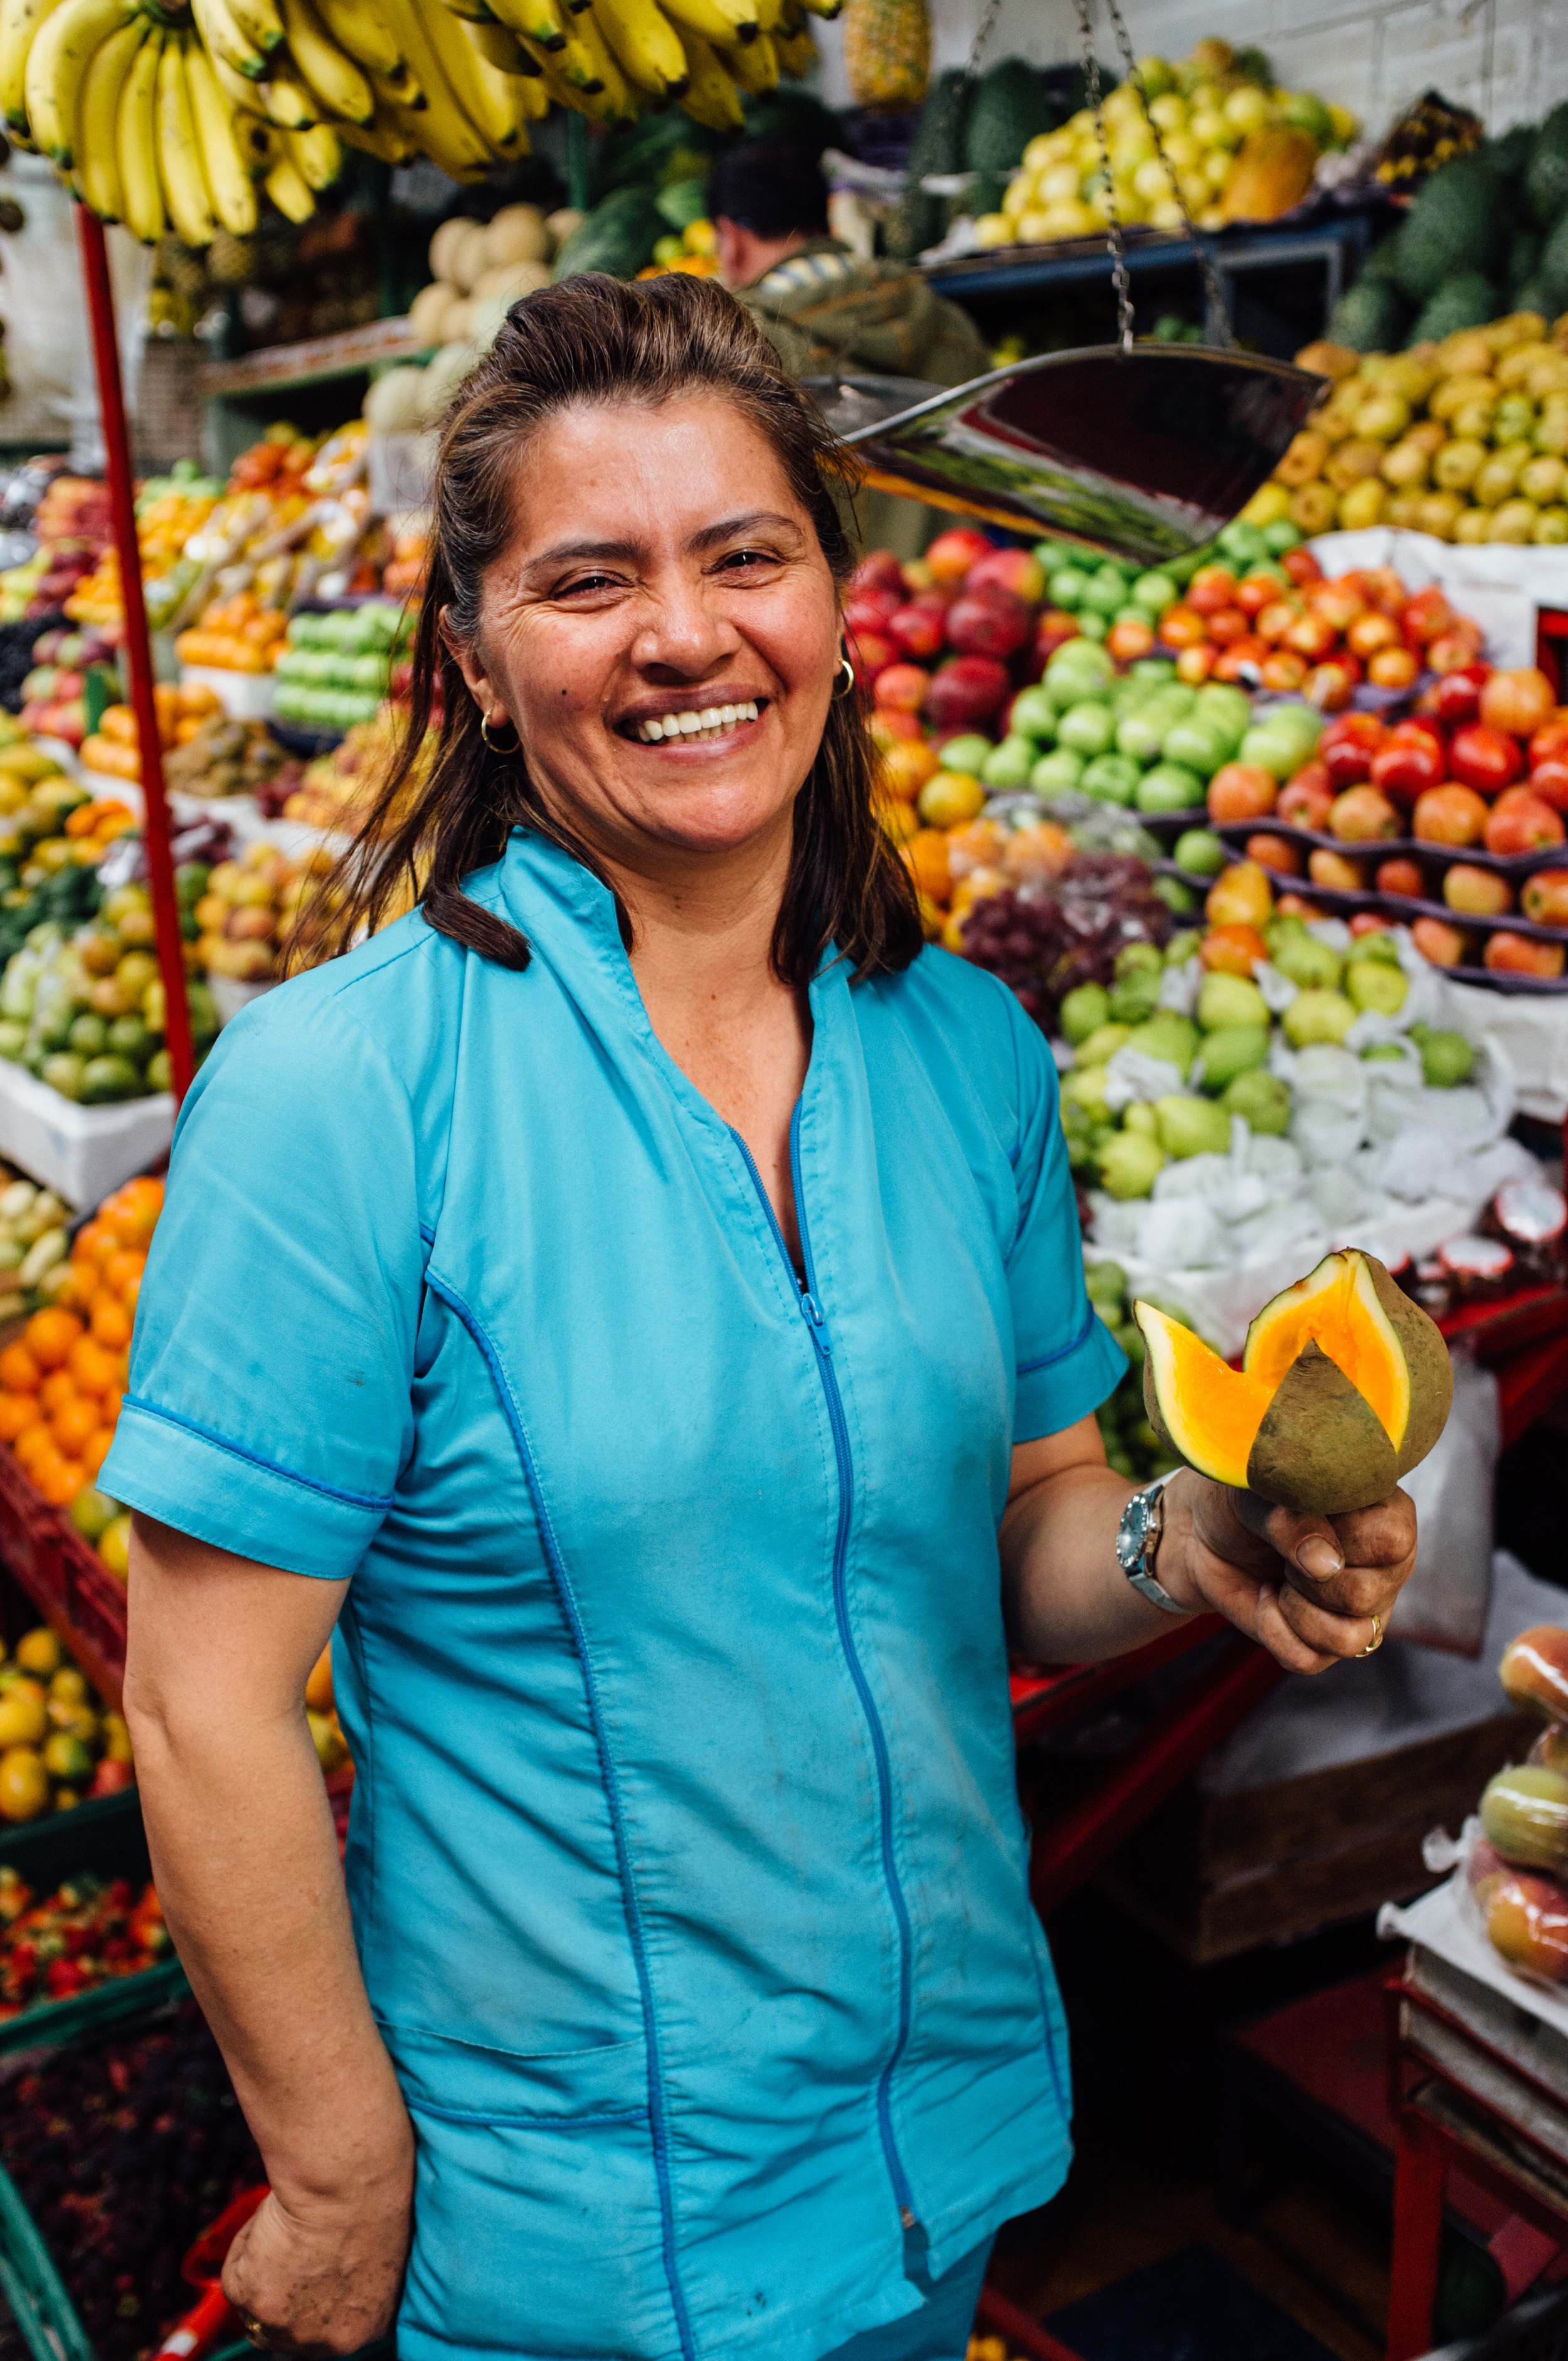 Chatica, a vendor at theMercado de Paloquemao, modeling a nísperofor us